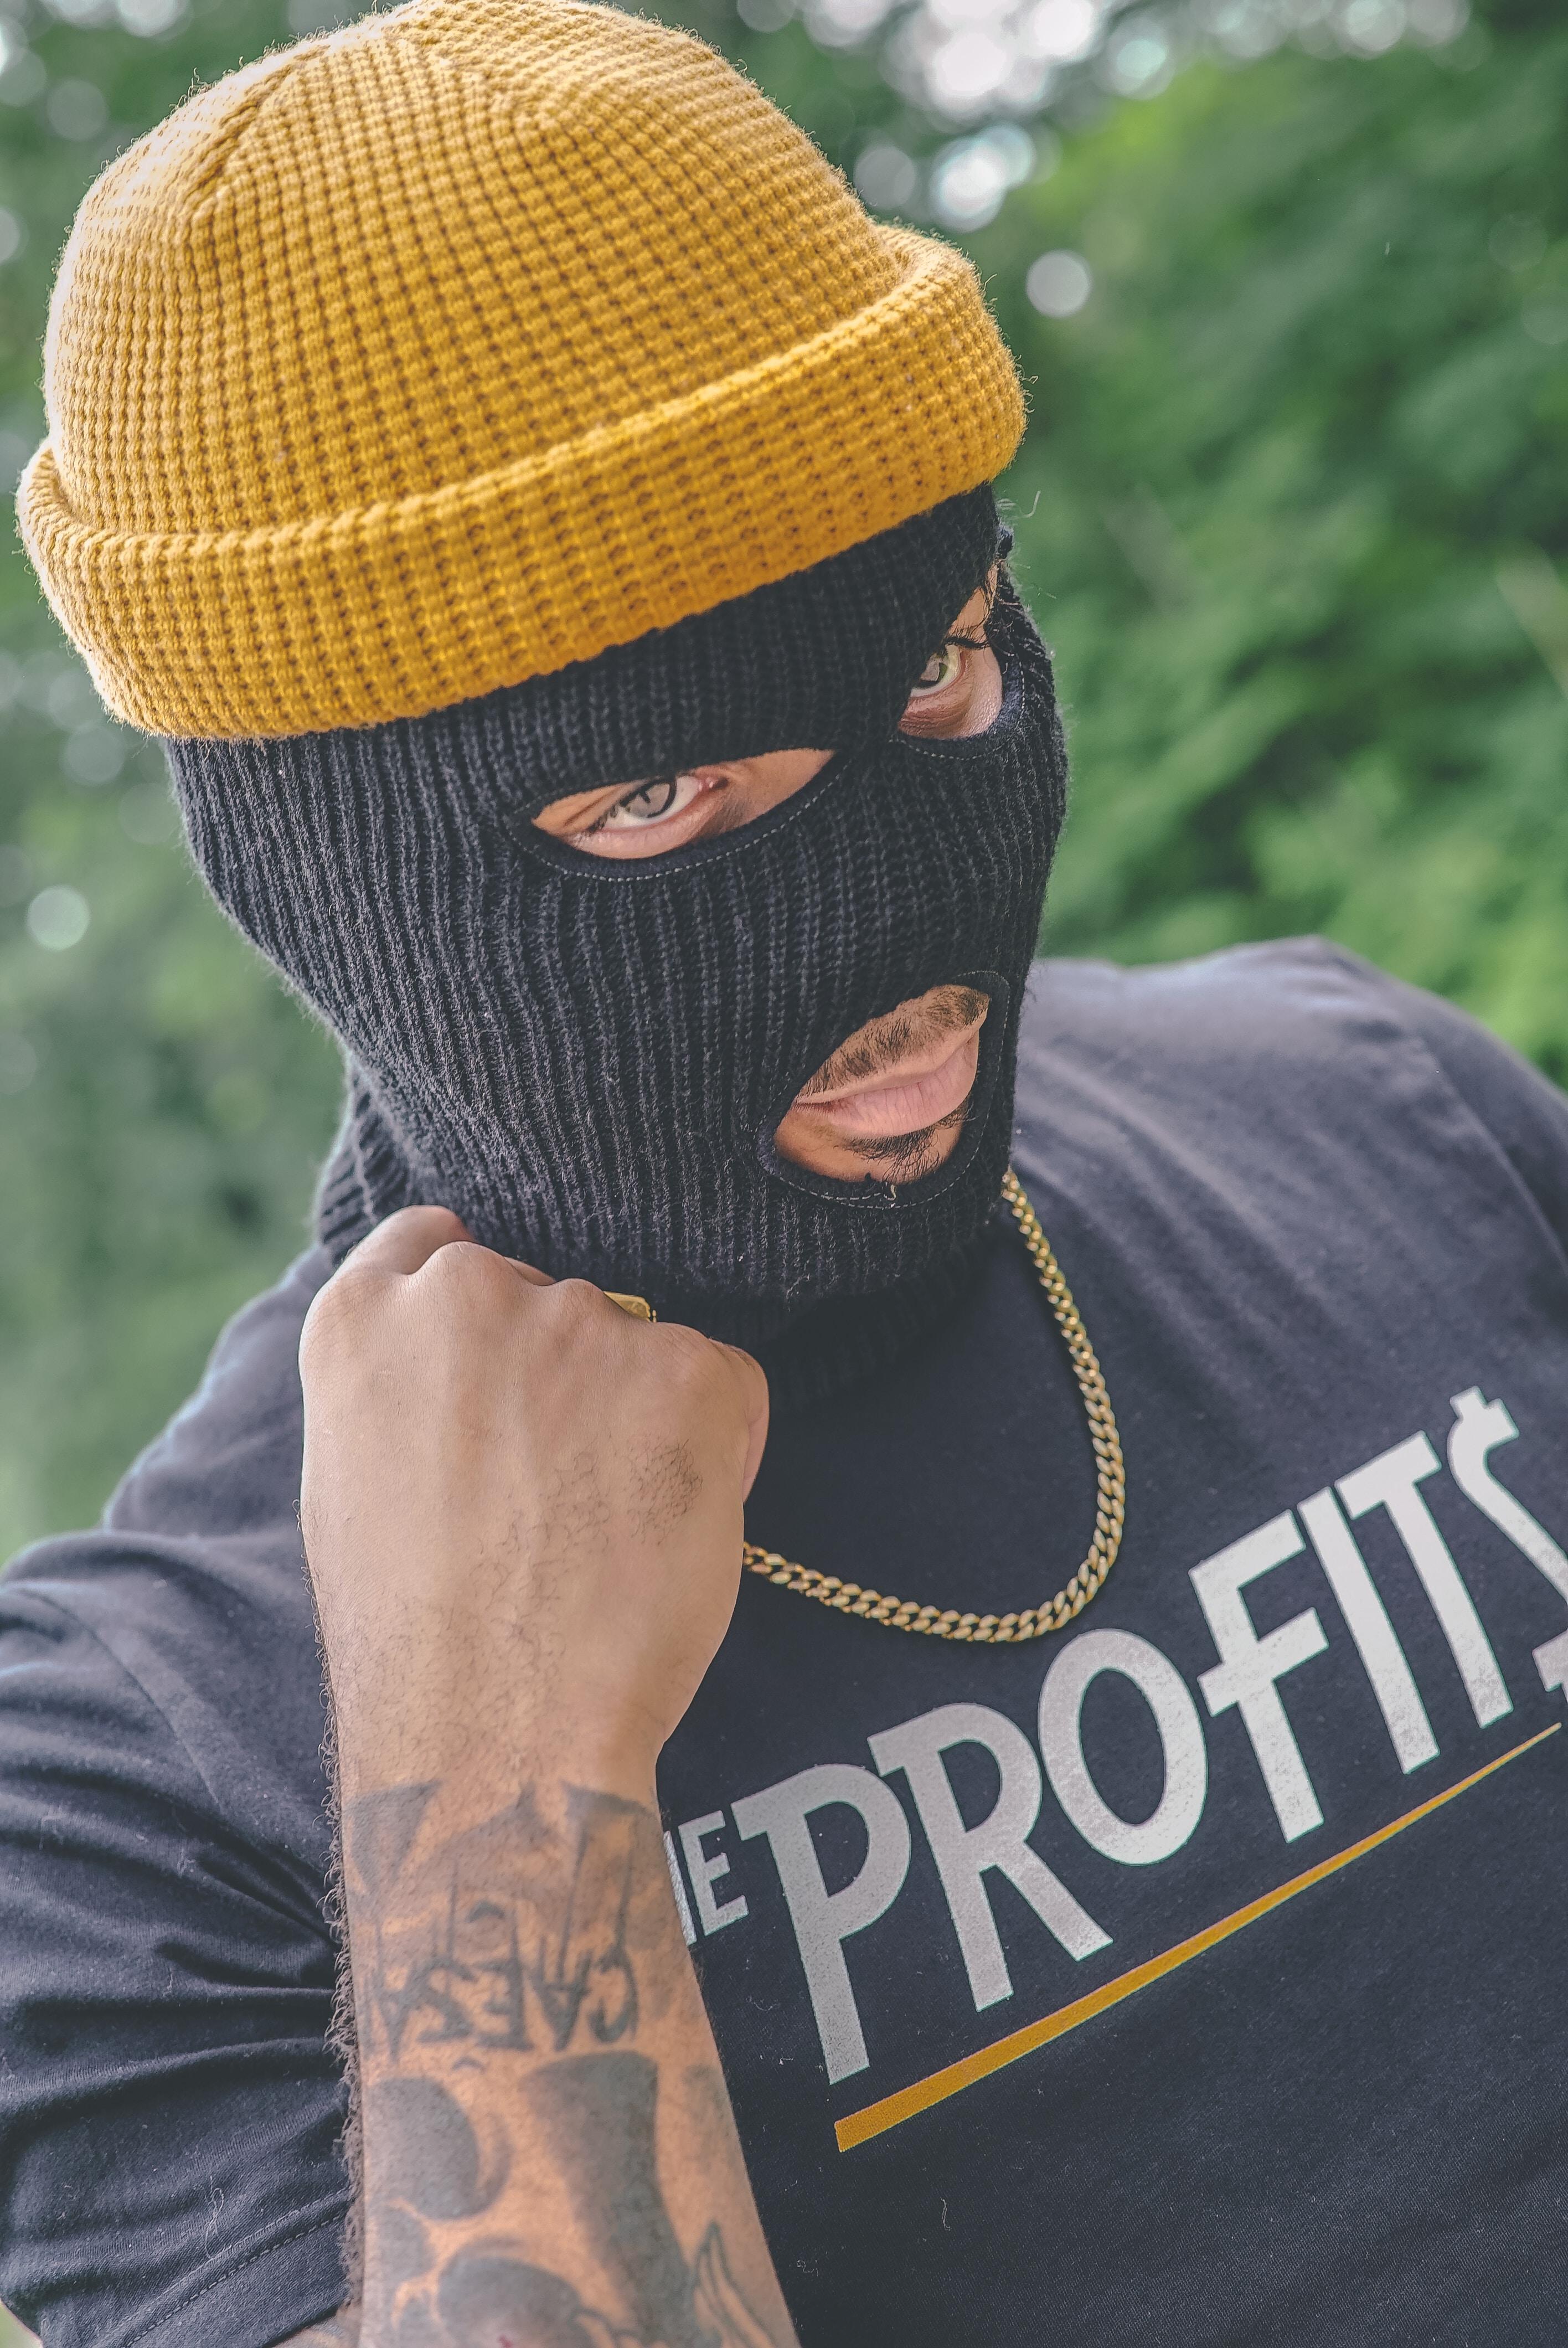 man wearing black balaclava mask and brown knit cap outdoor during daytime